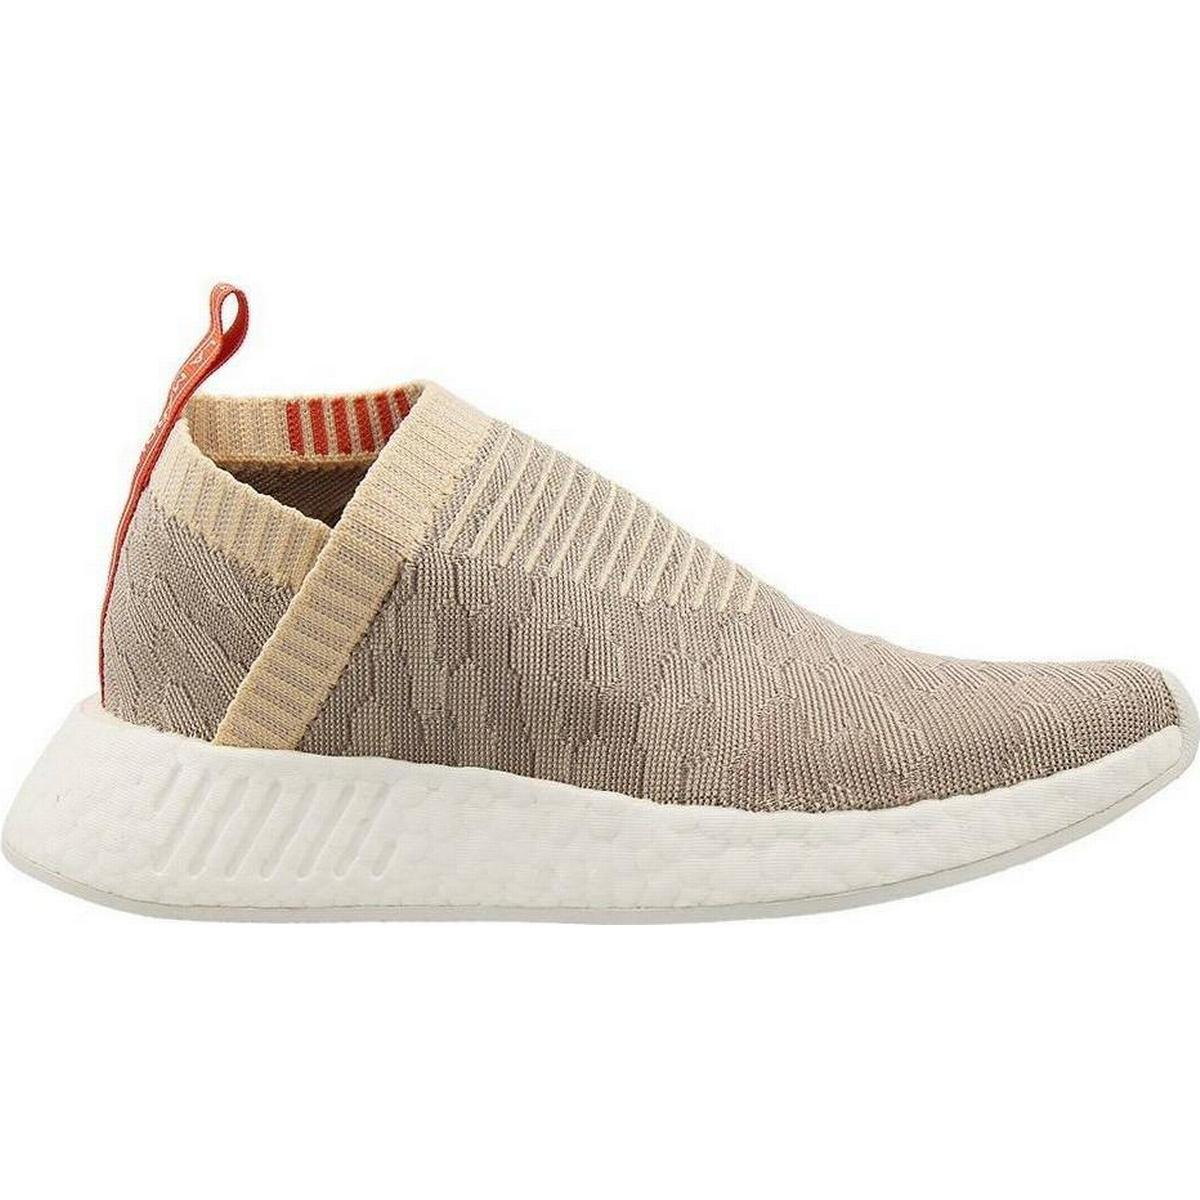 Adidas primeknit w • Hitta det lägsta priset hos PriceRunner